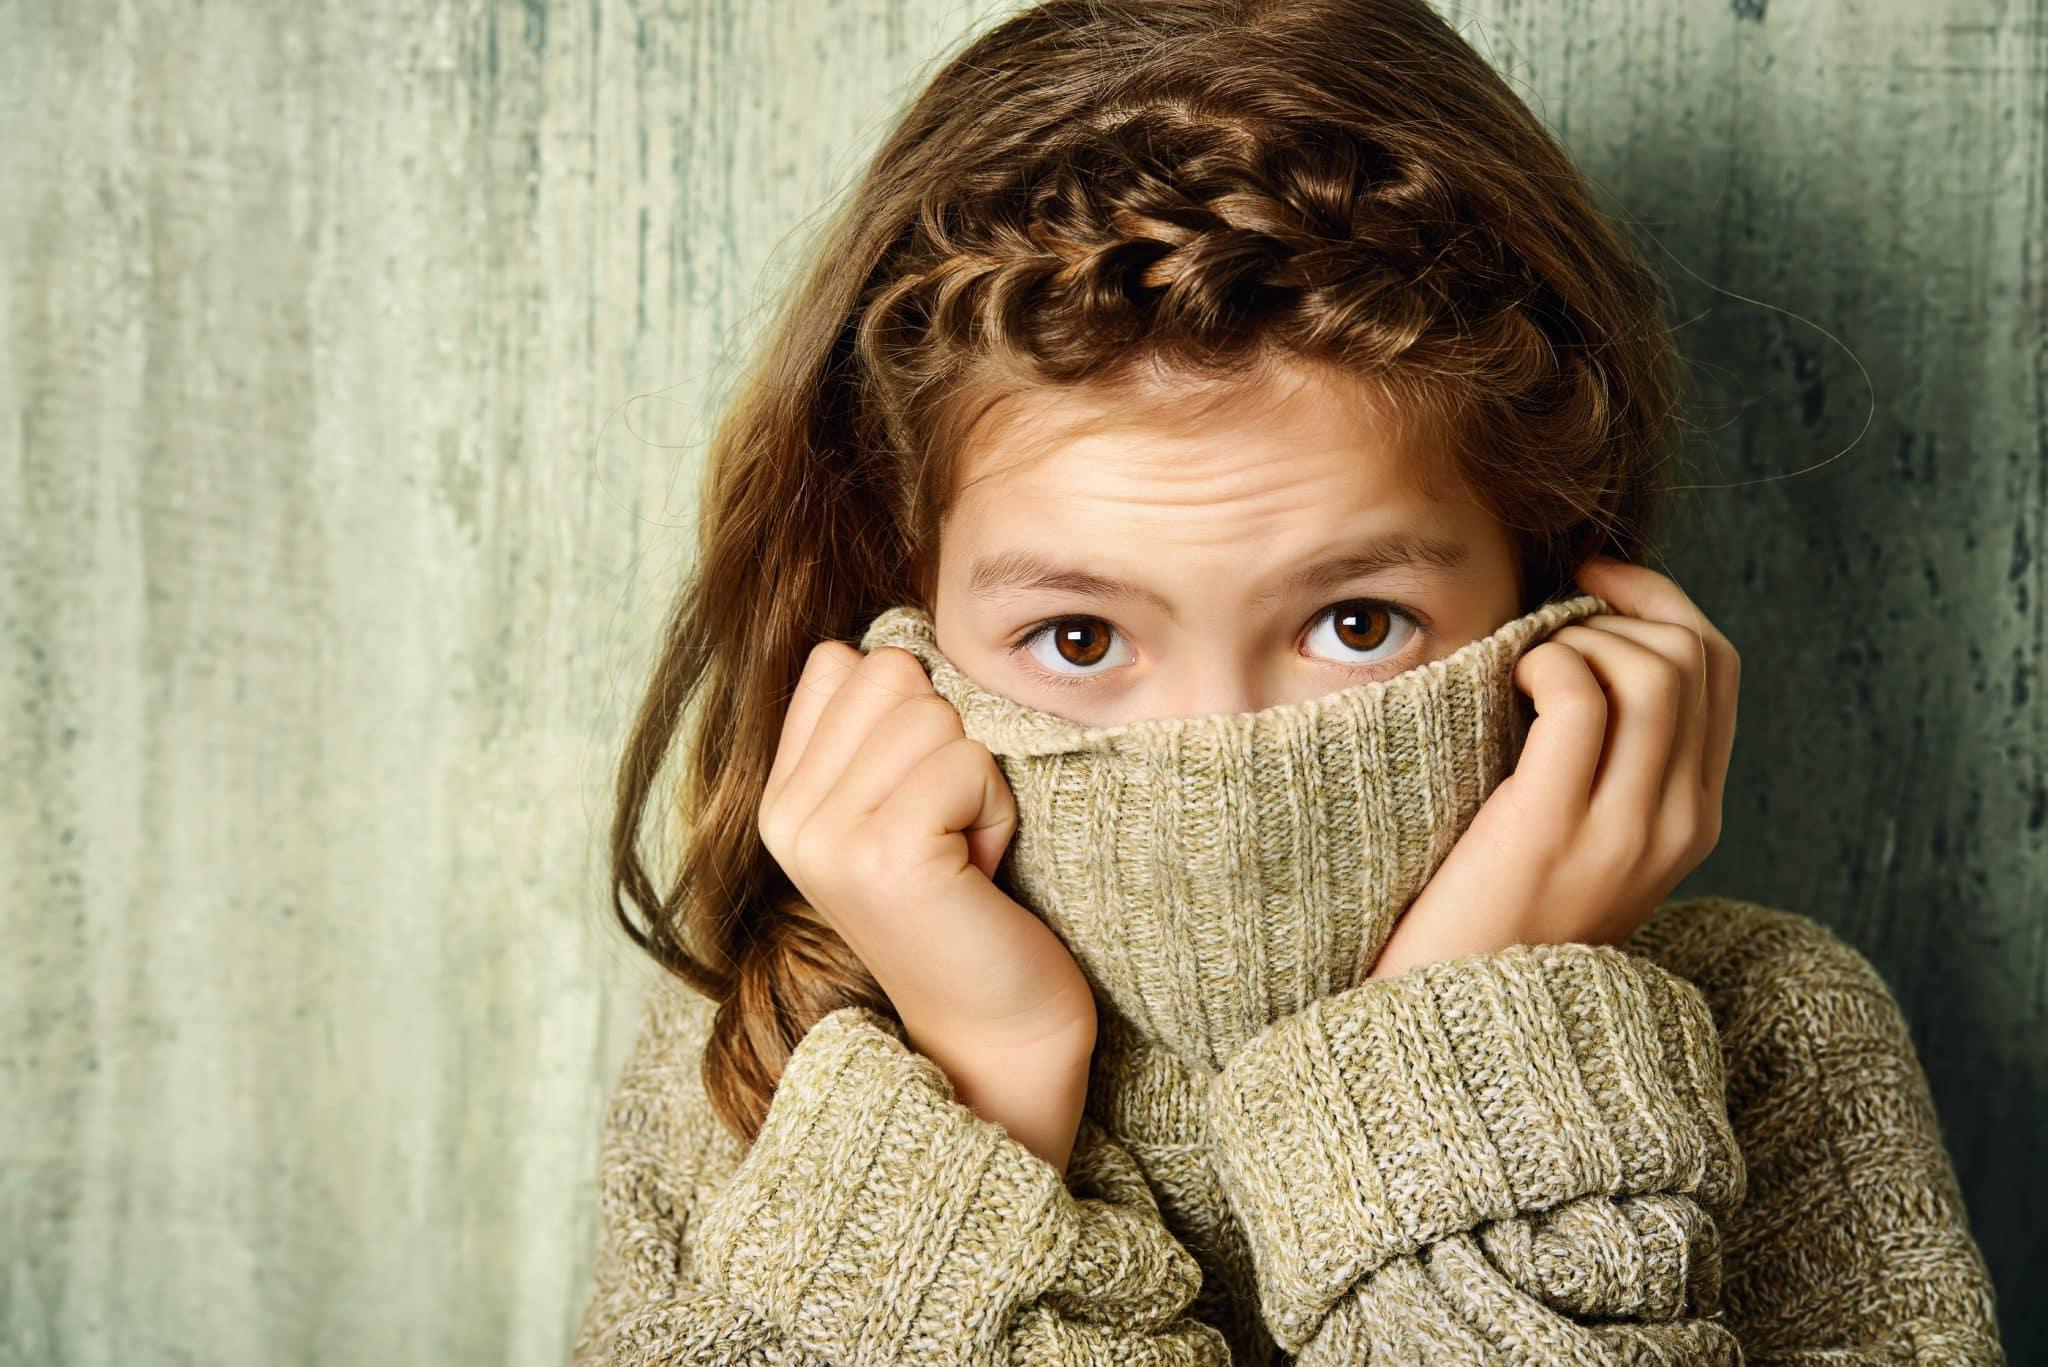 anxious kid face.jpg